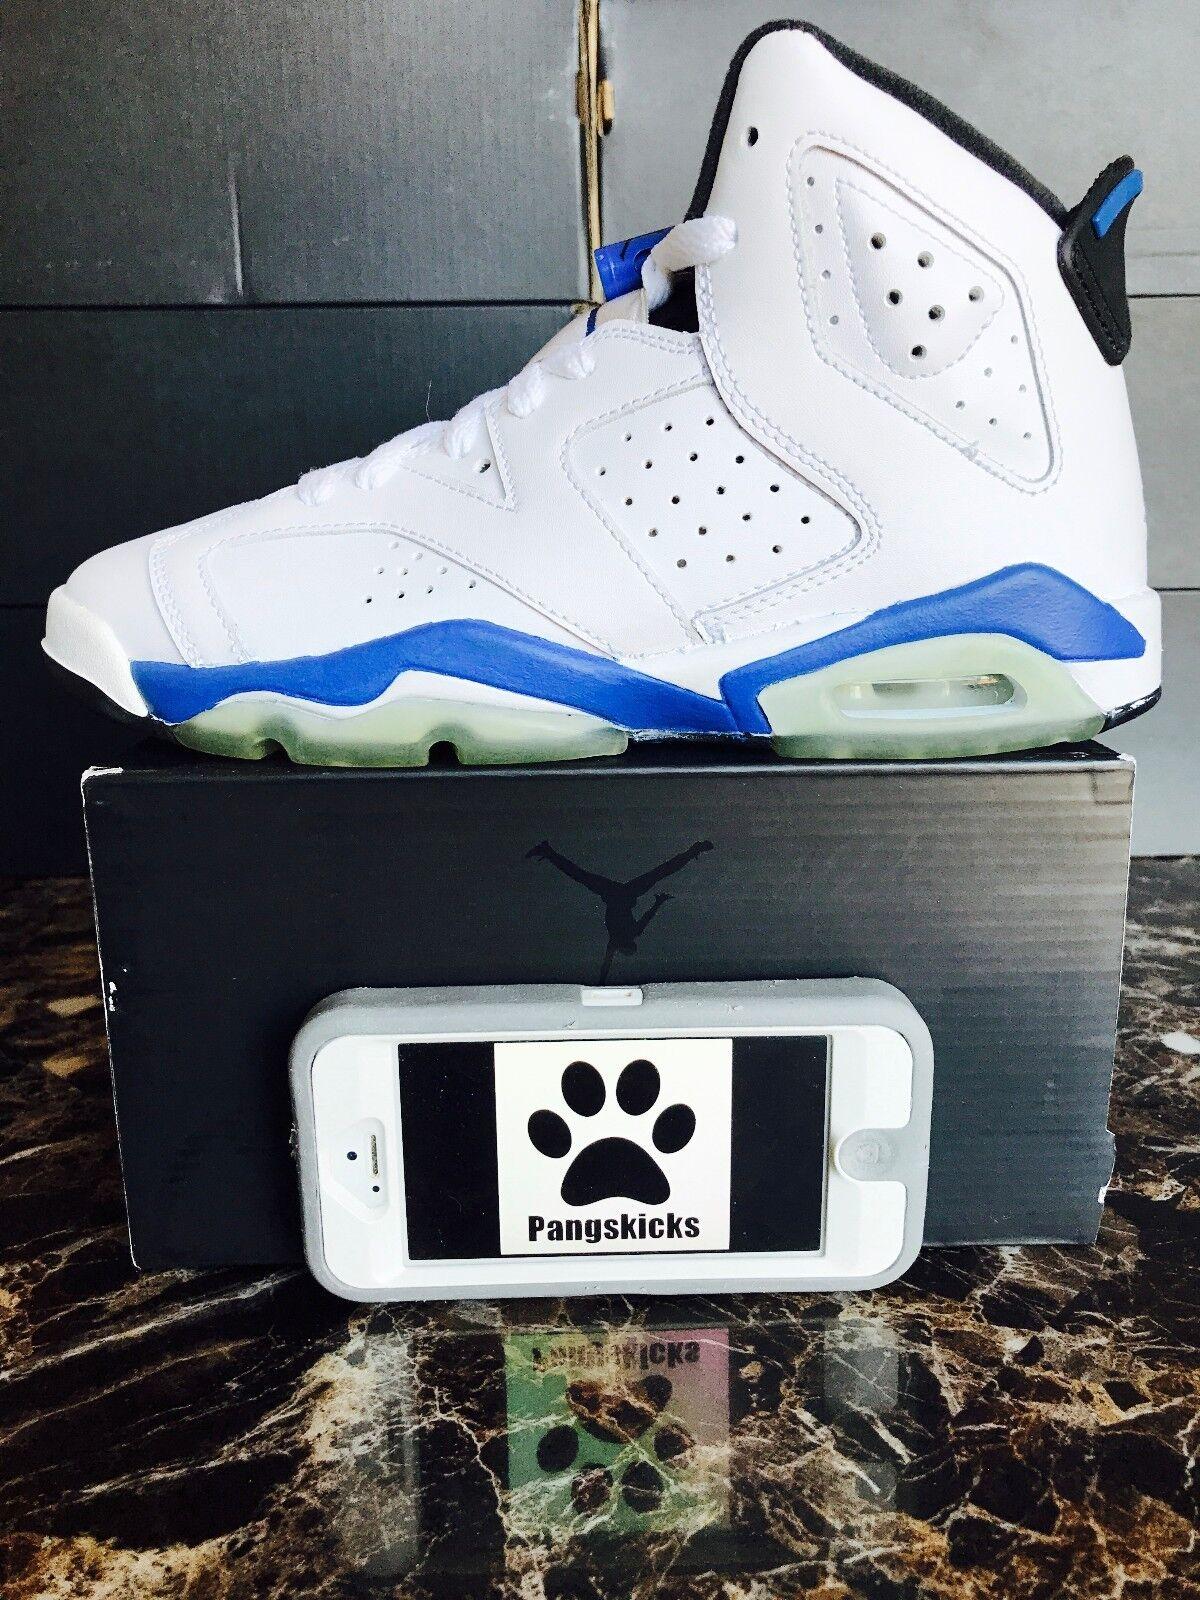 Nike Air Jordan 6 Retro  Sport bluee  White 384665-107 GS Size 4.5Y-5.5Y